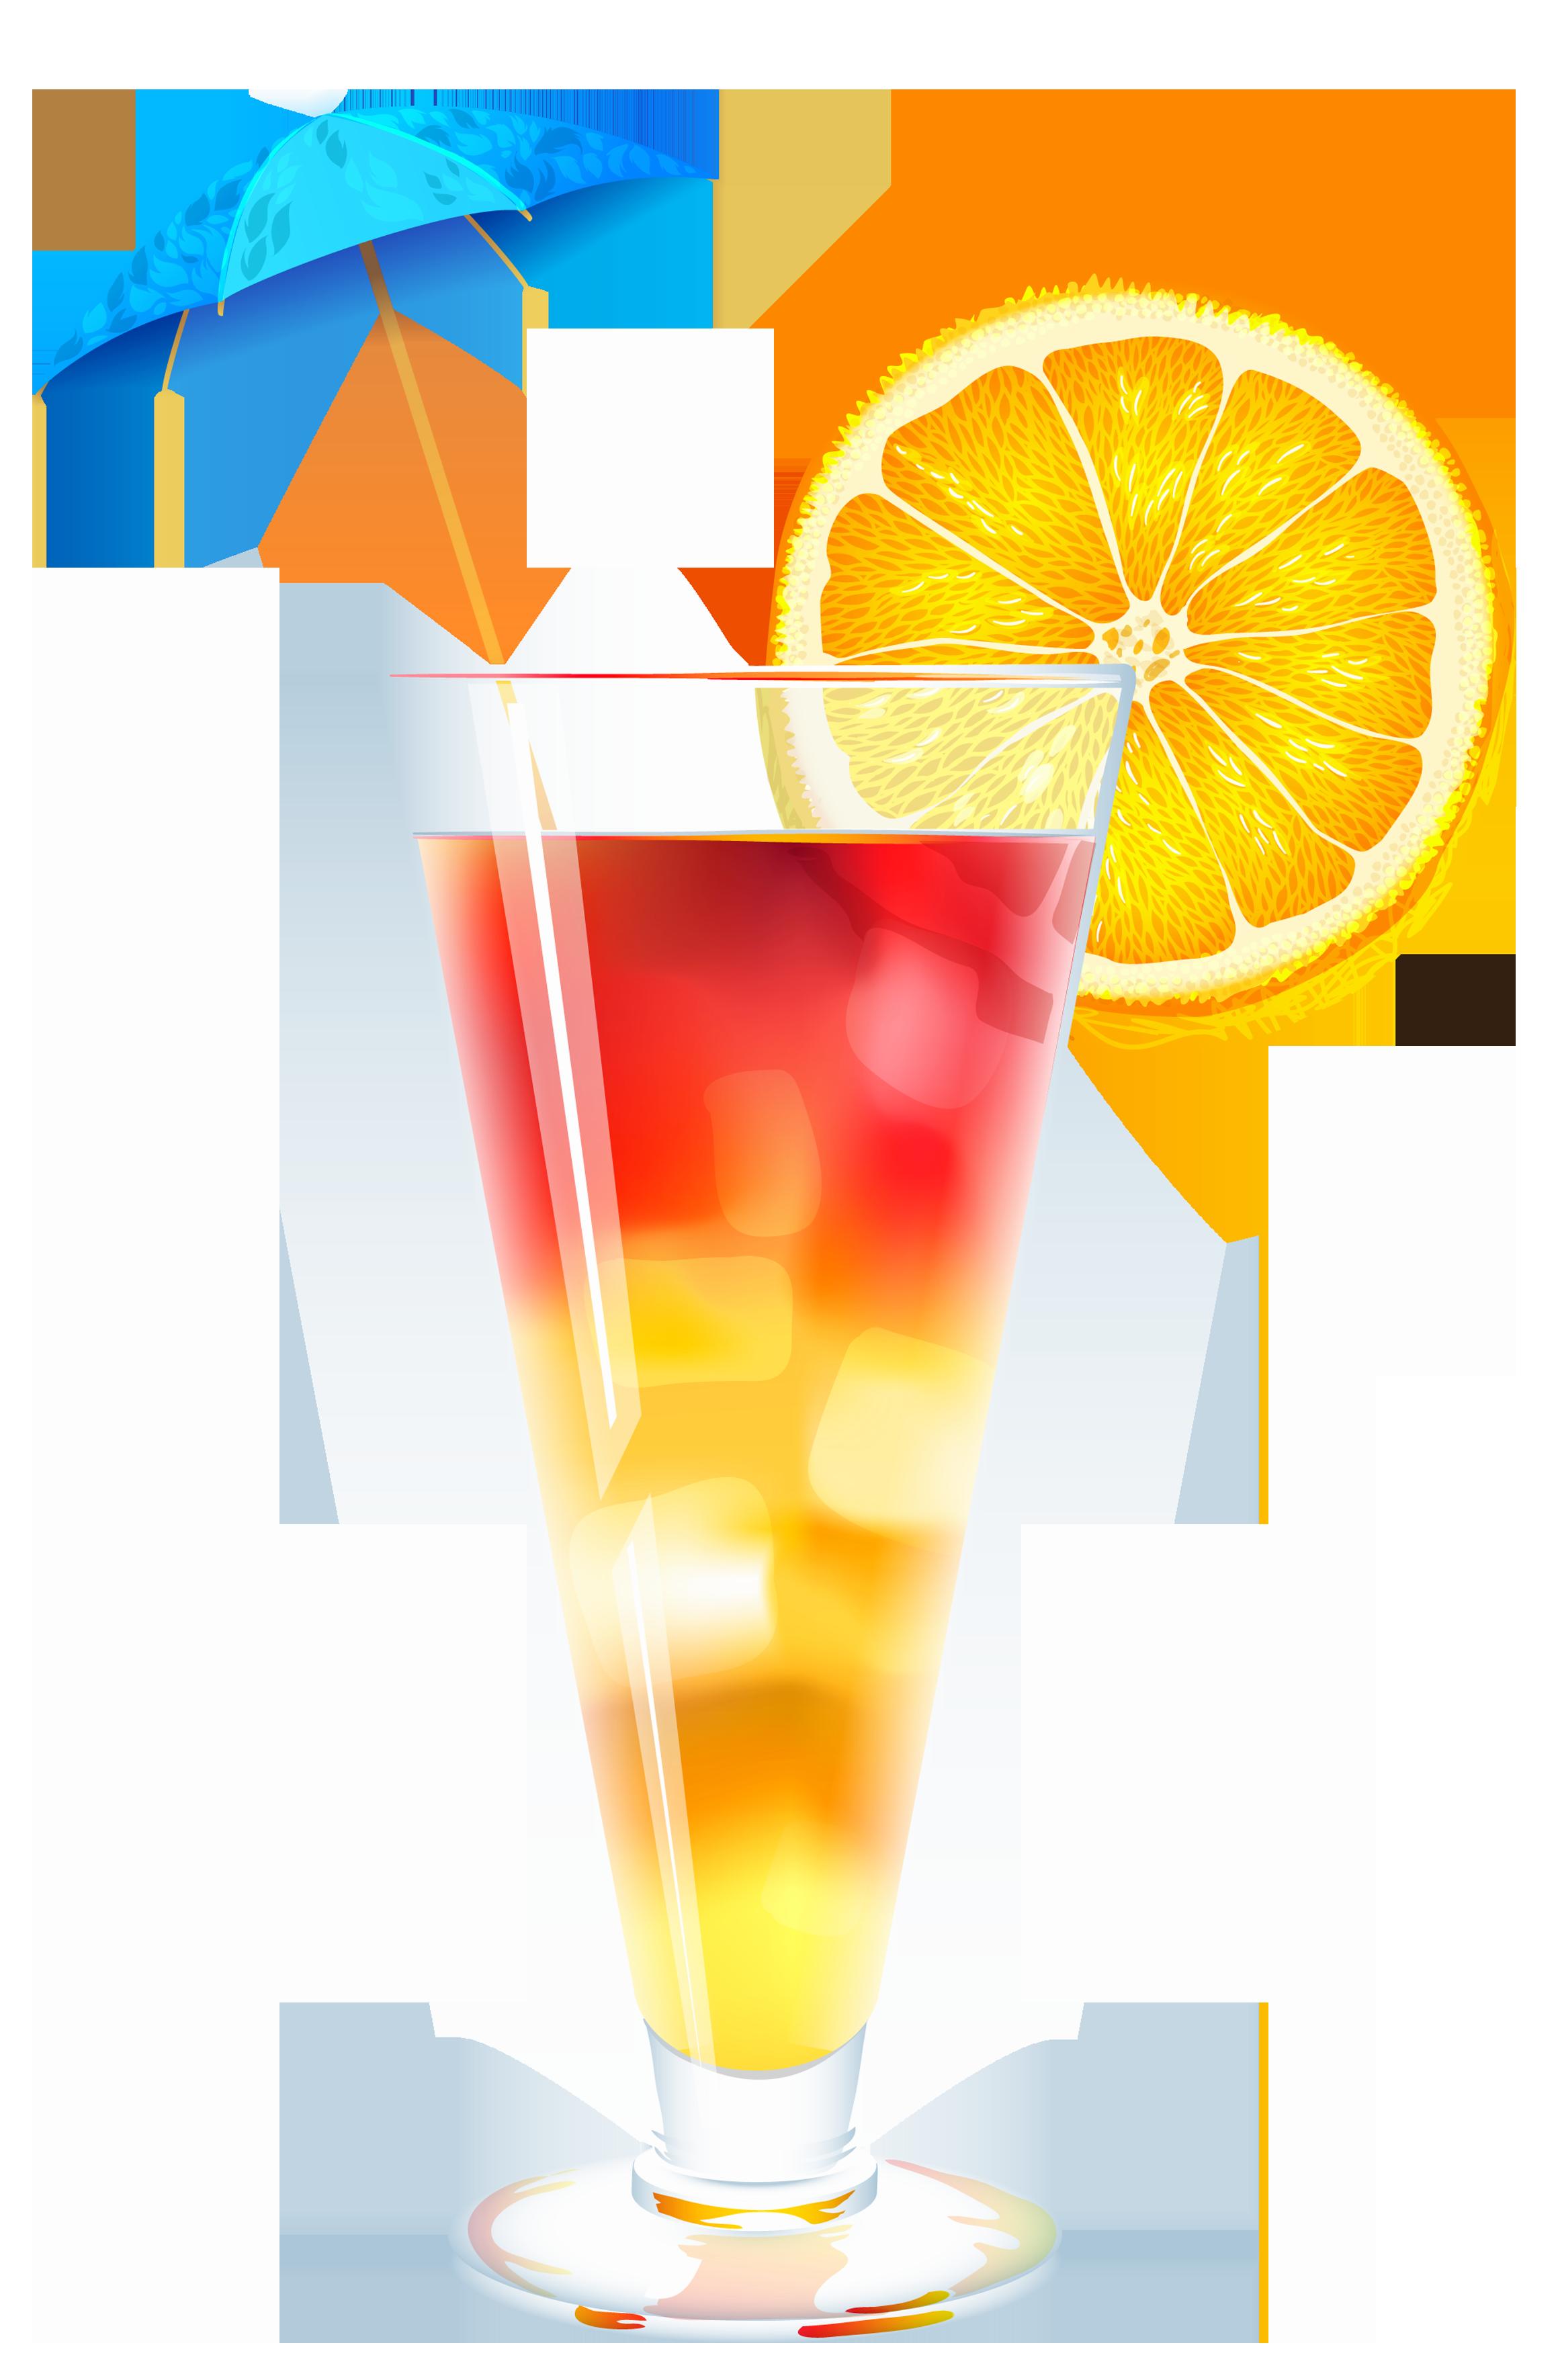 jpg transparent Drinks clipart. Summer cocktail png image